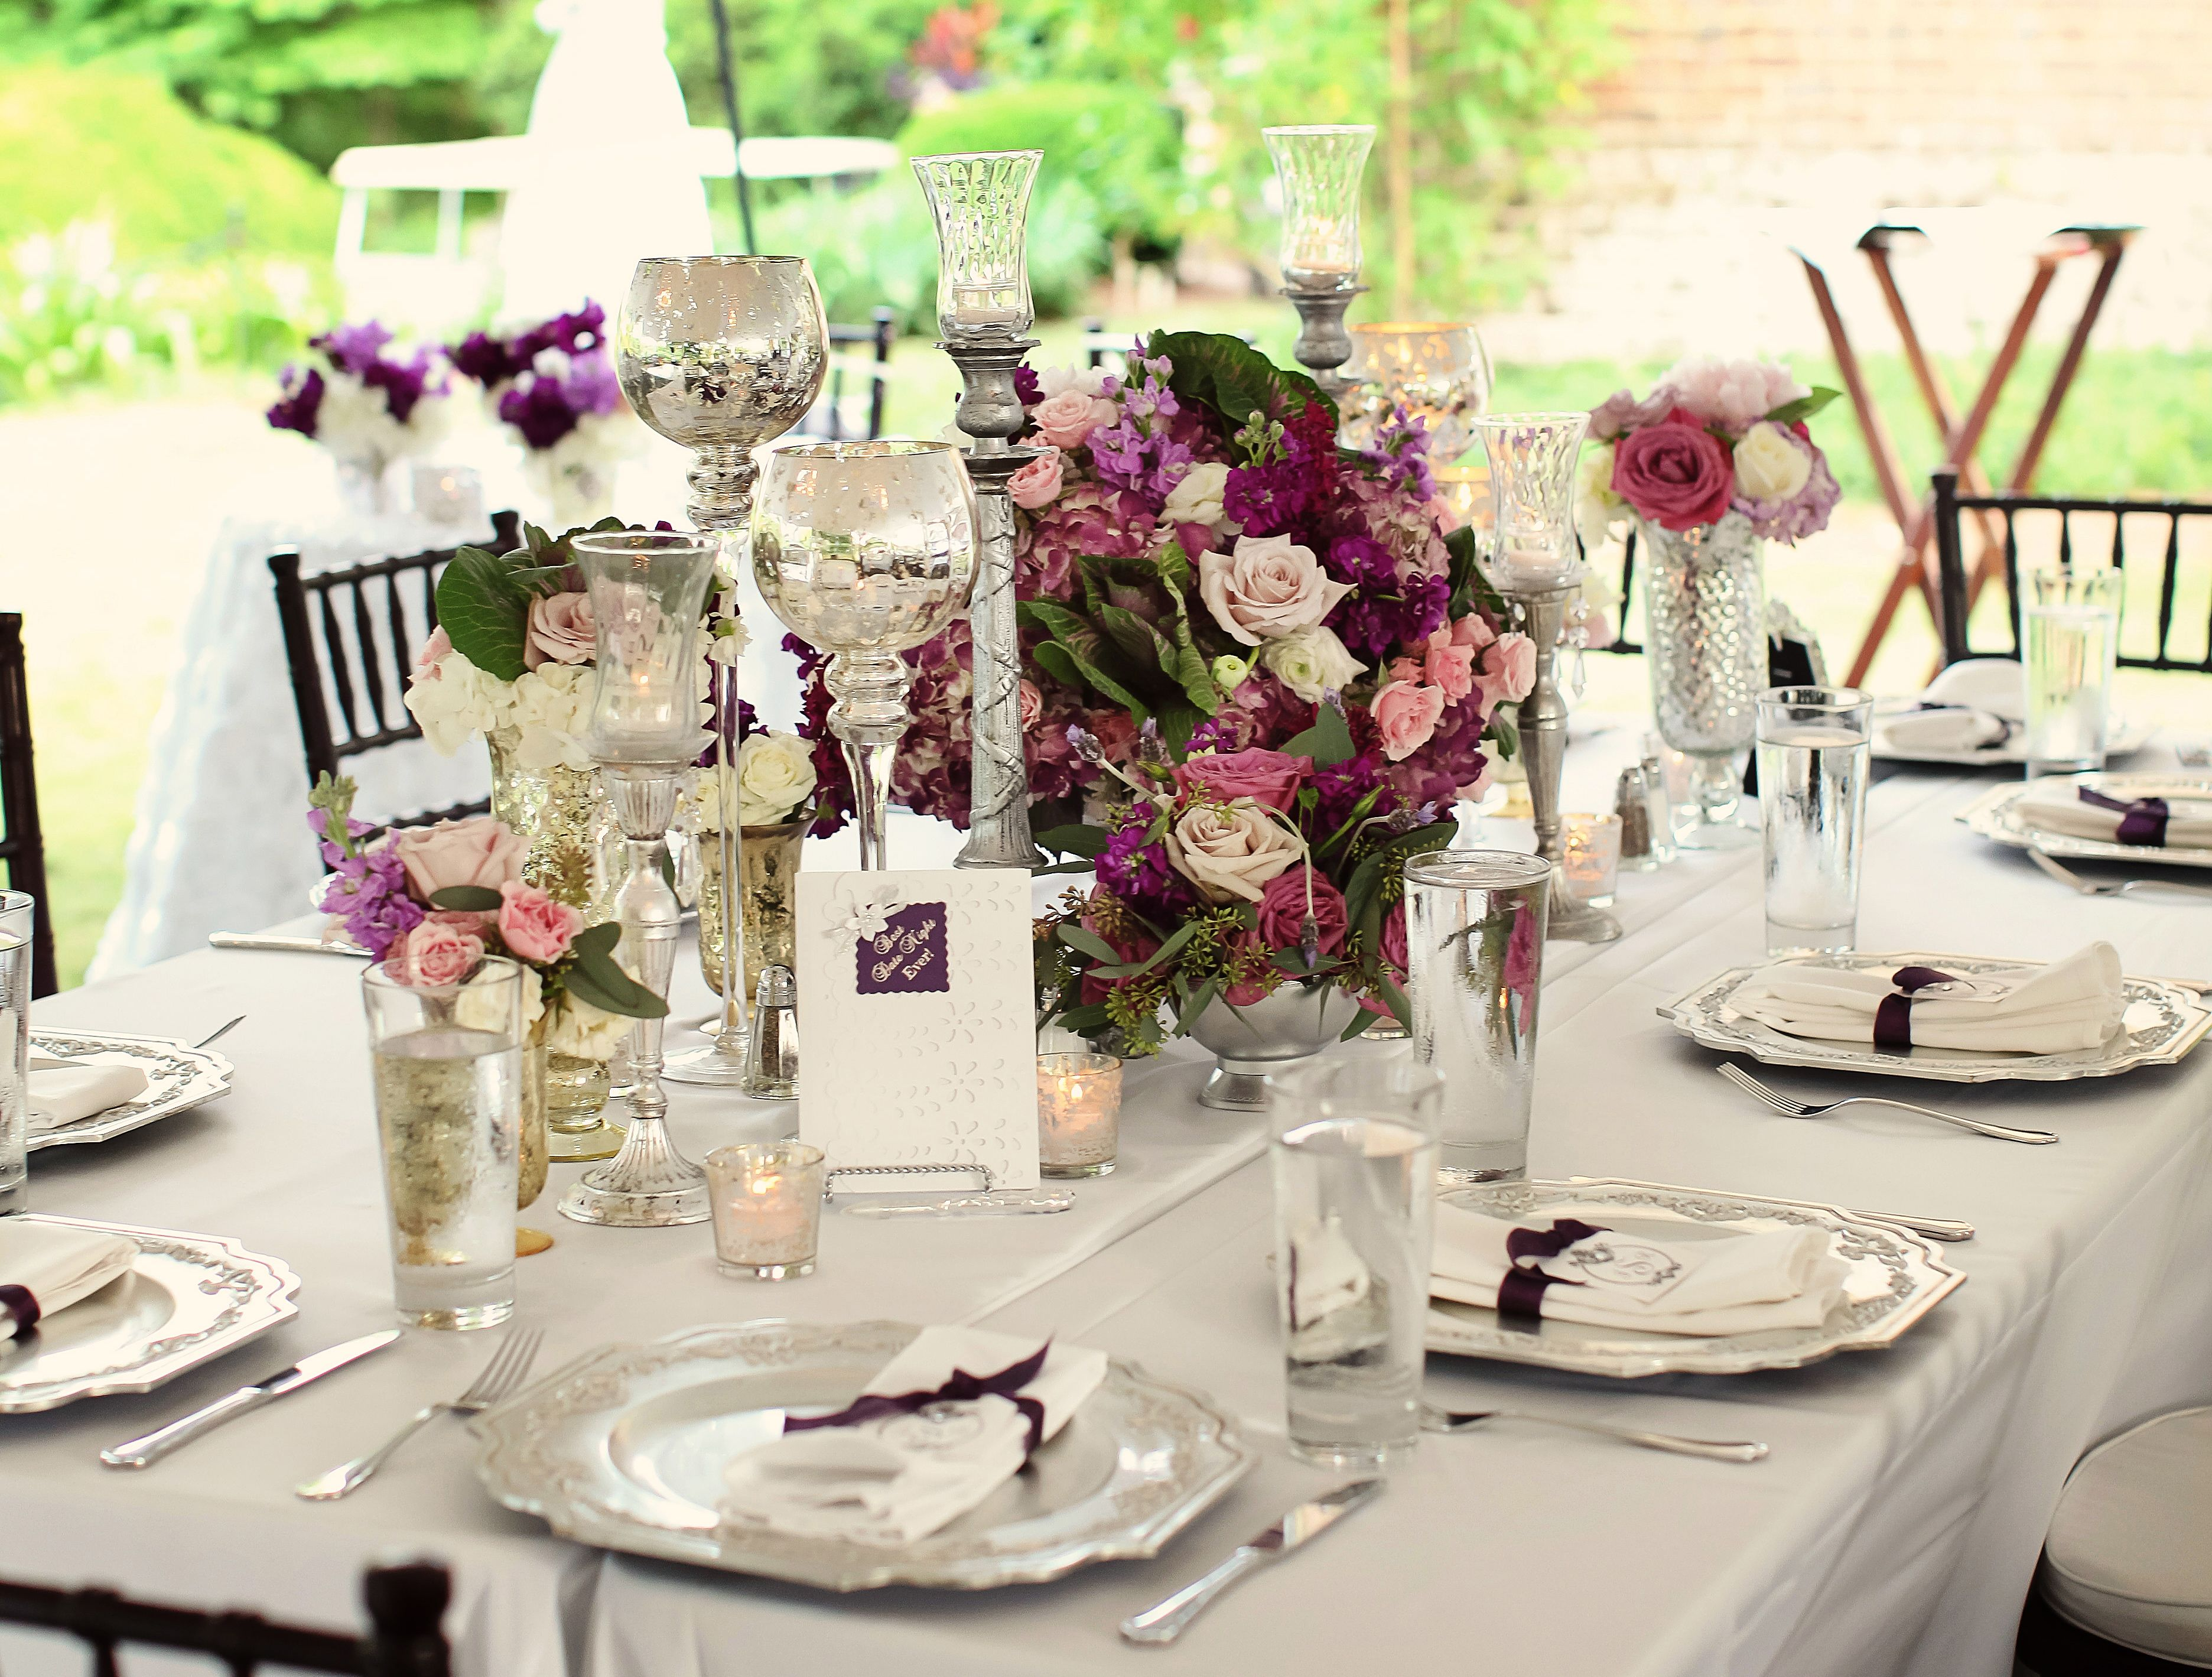 ©nadia D photography 2012. Wedding costs, Budget wedding